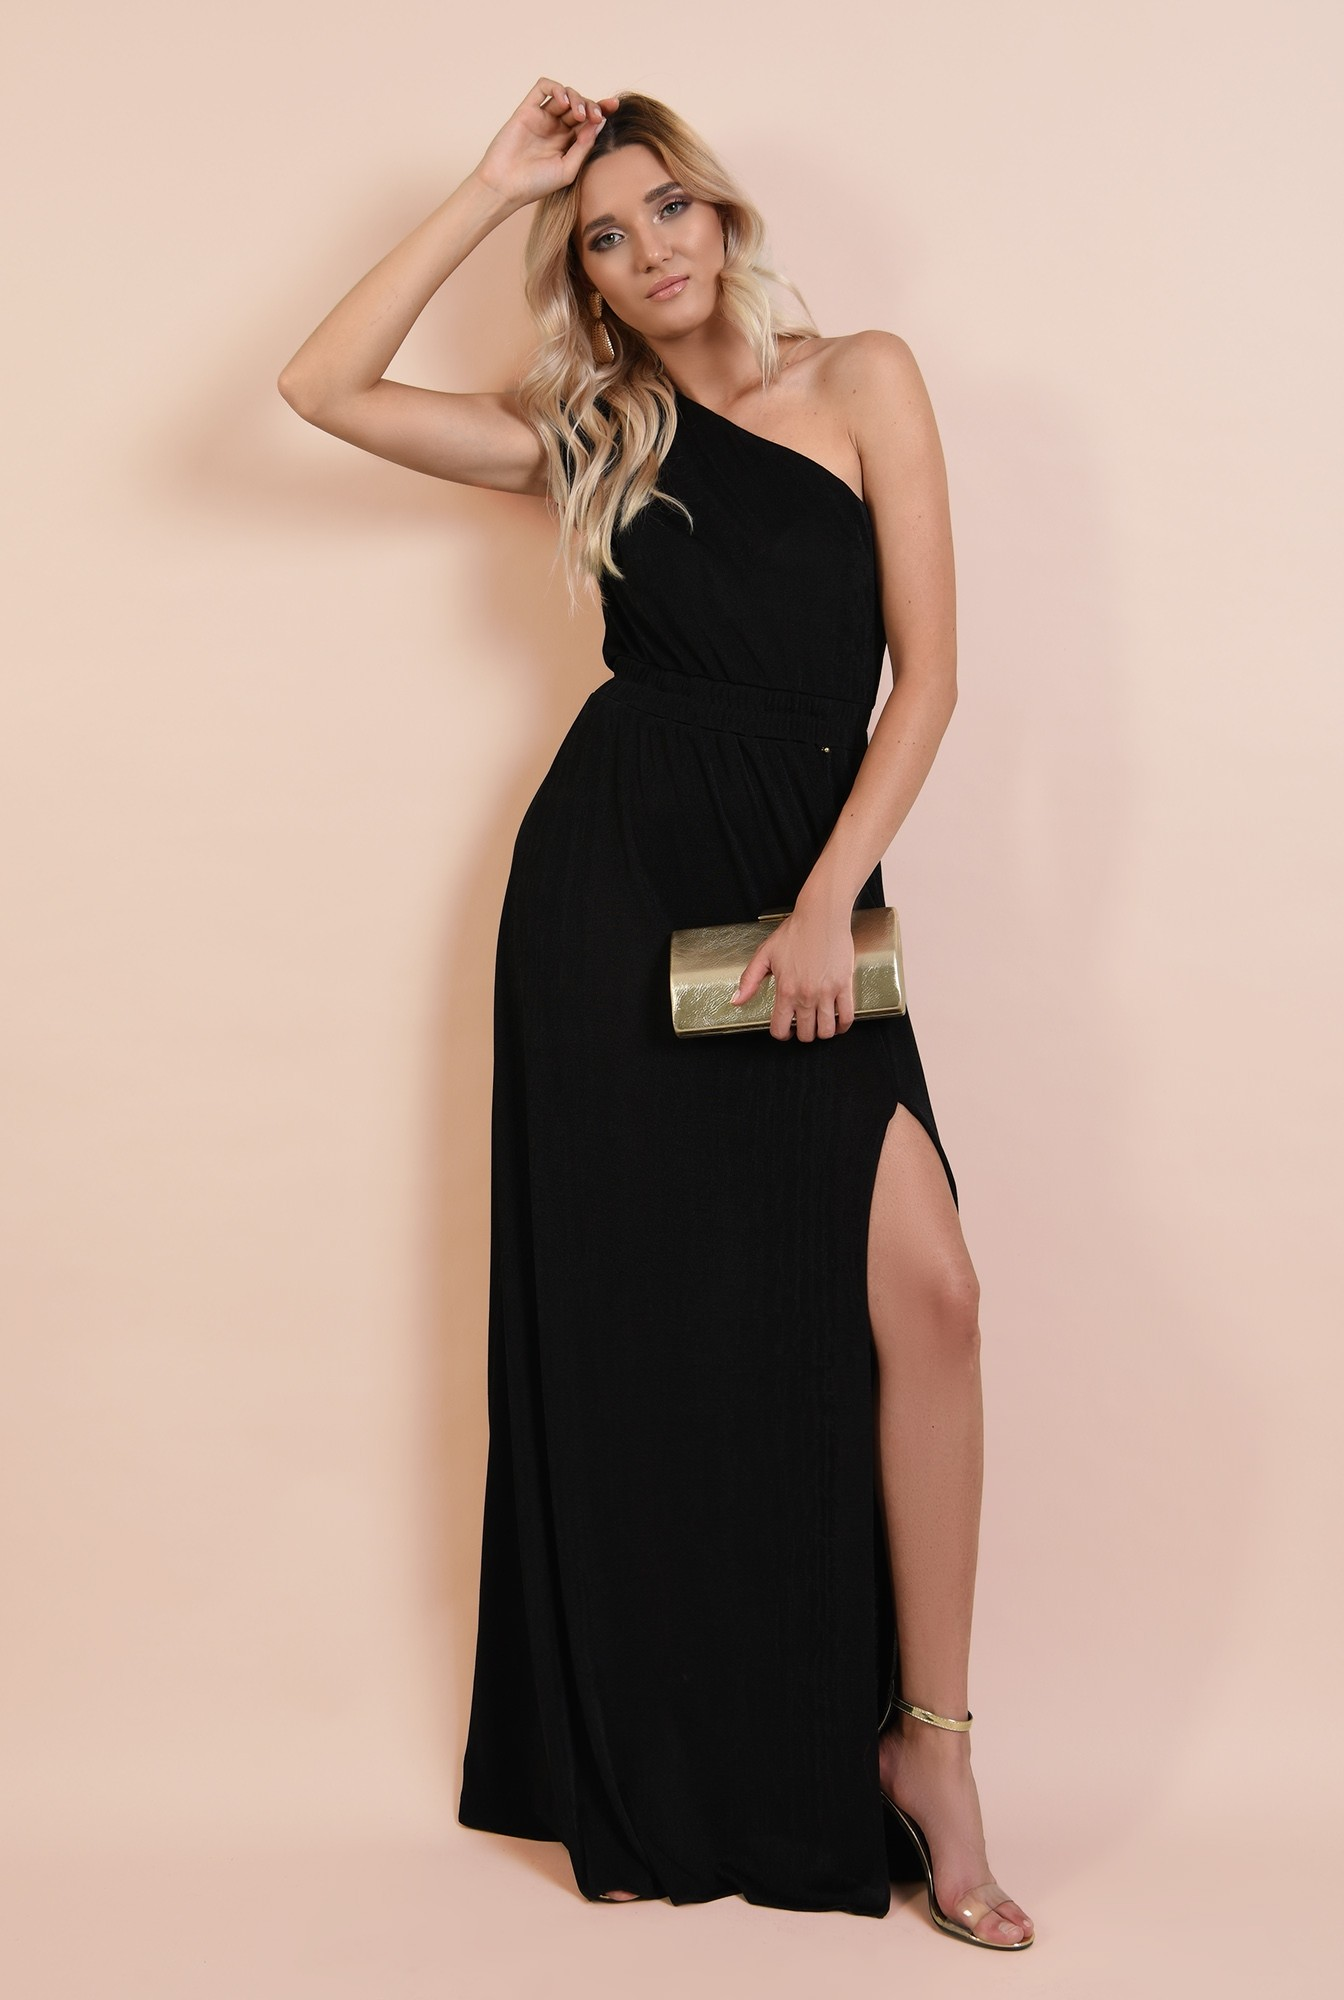 3 - rochie de seara, cu slit, talie variabila, umar gol, Poema, jerse lycra, umar fronsat